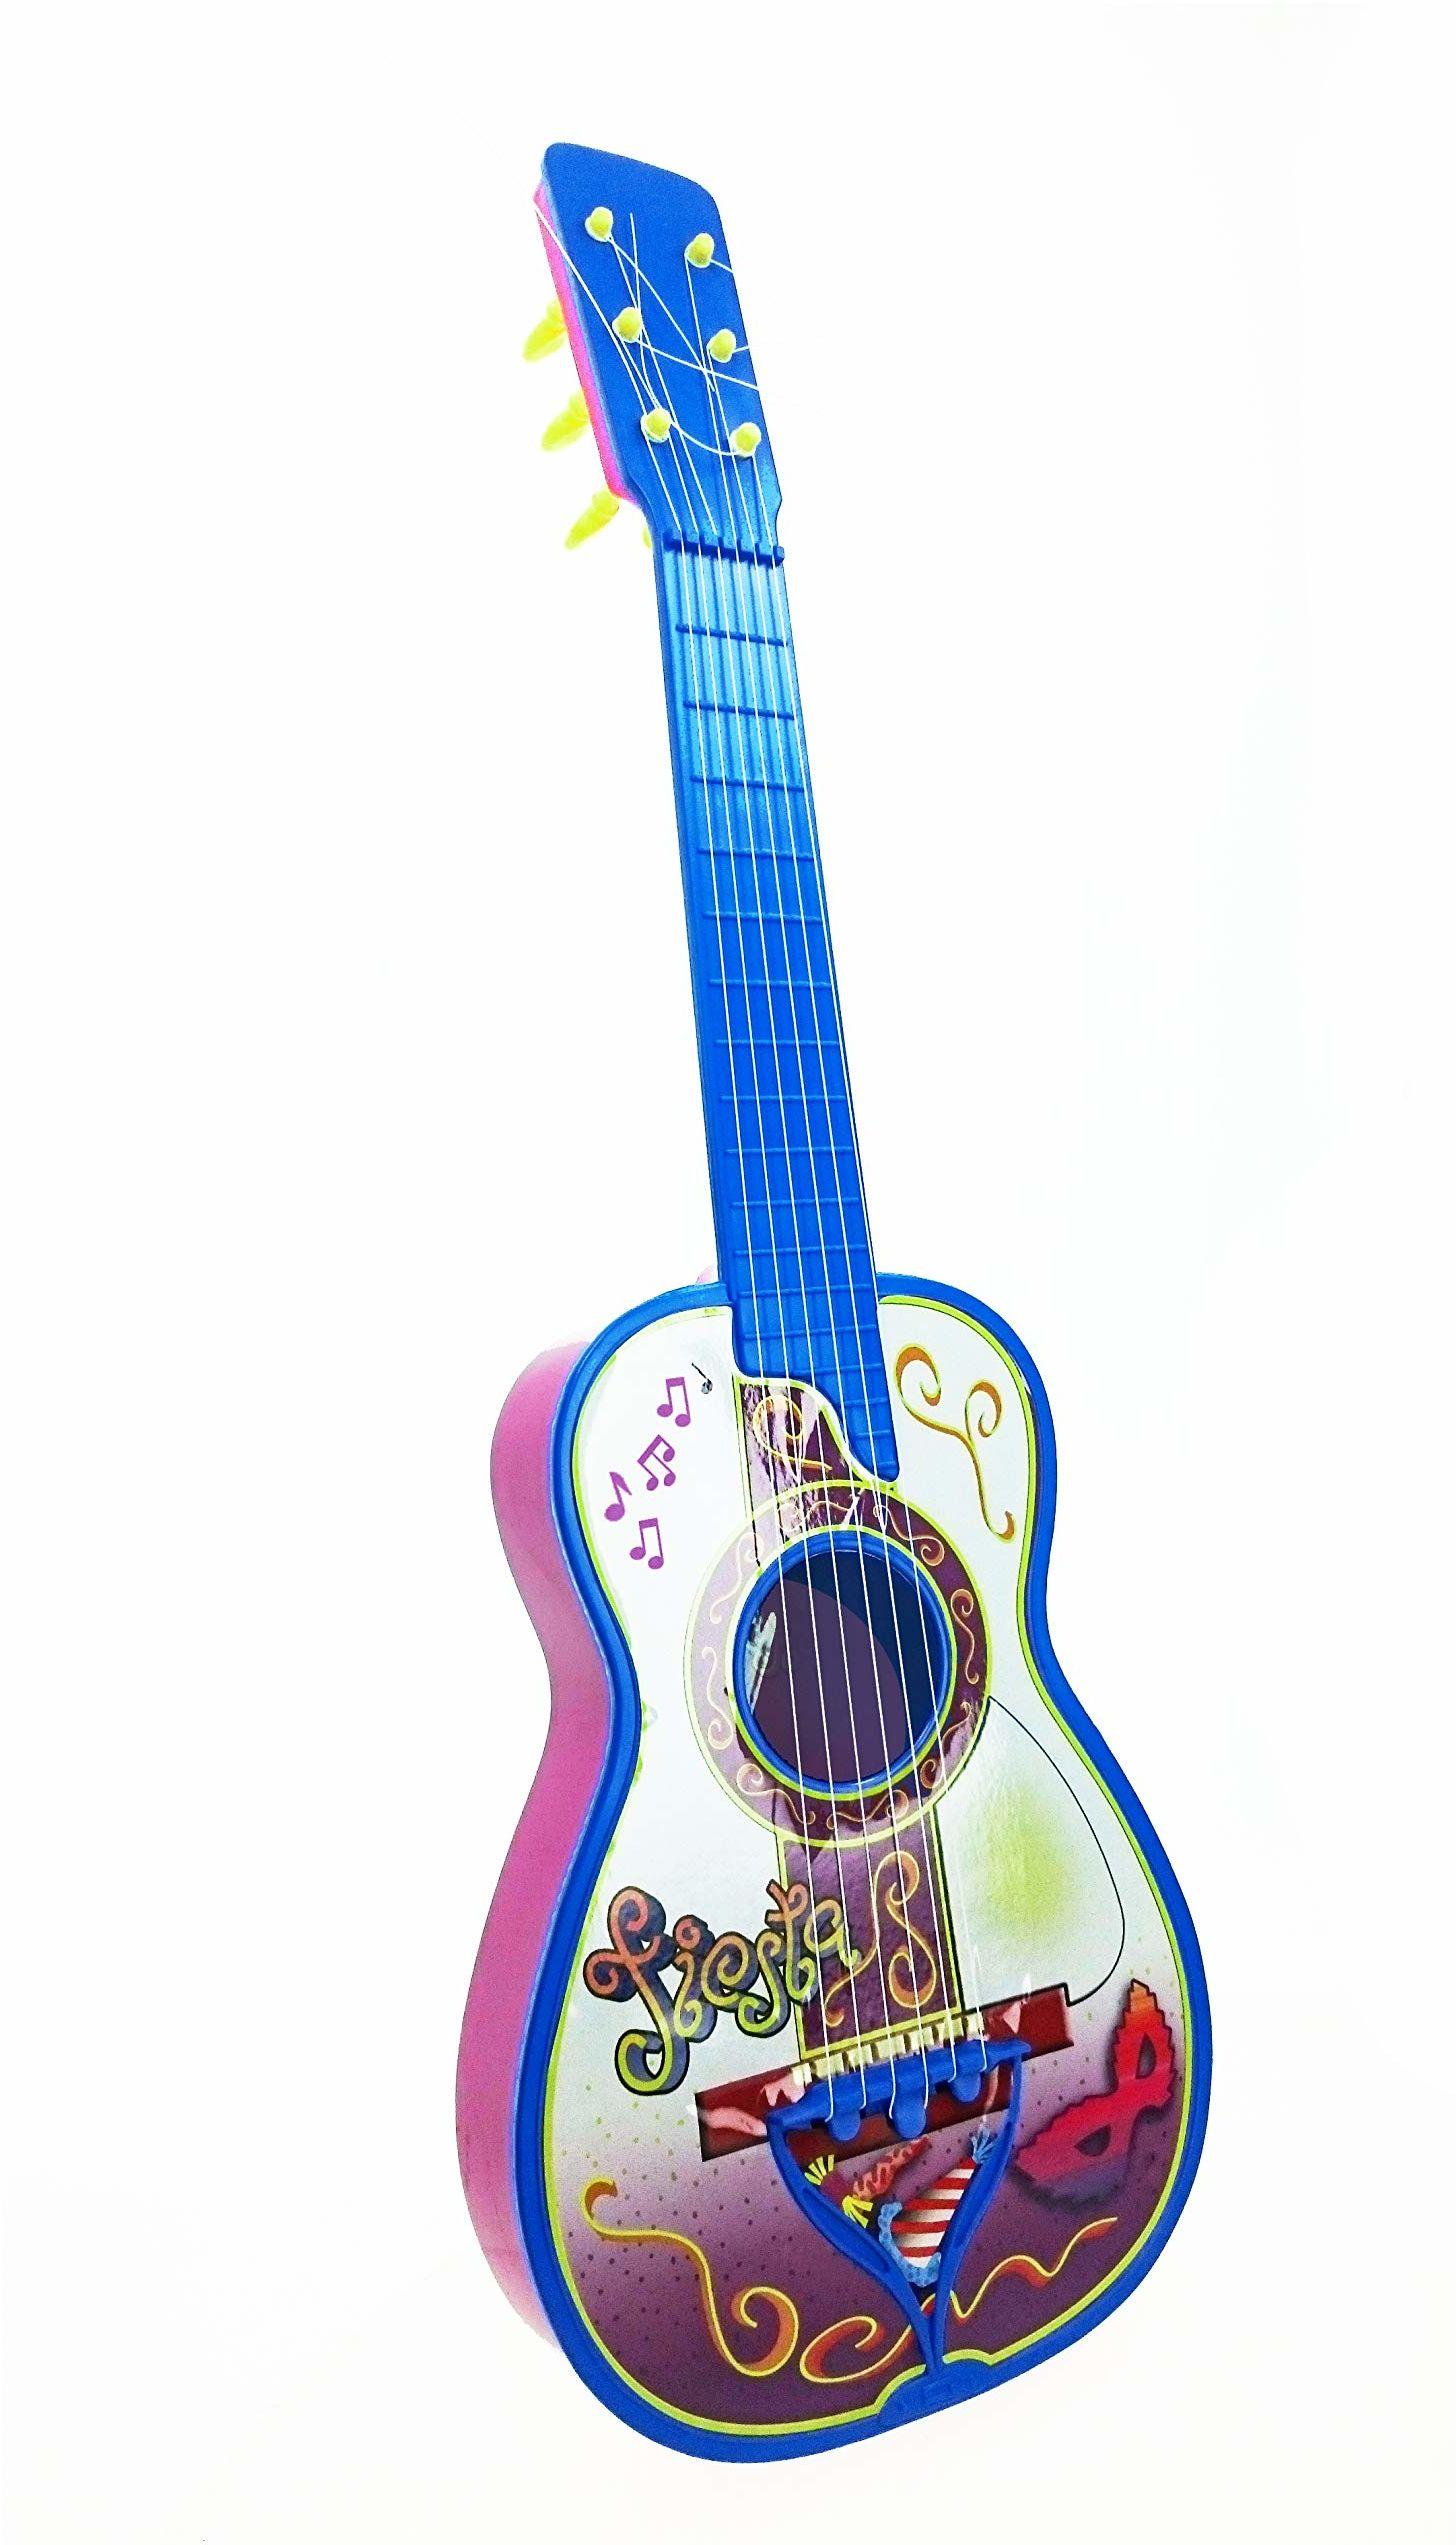 Reig Fiesta gitara 6-strunowa